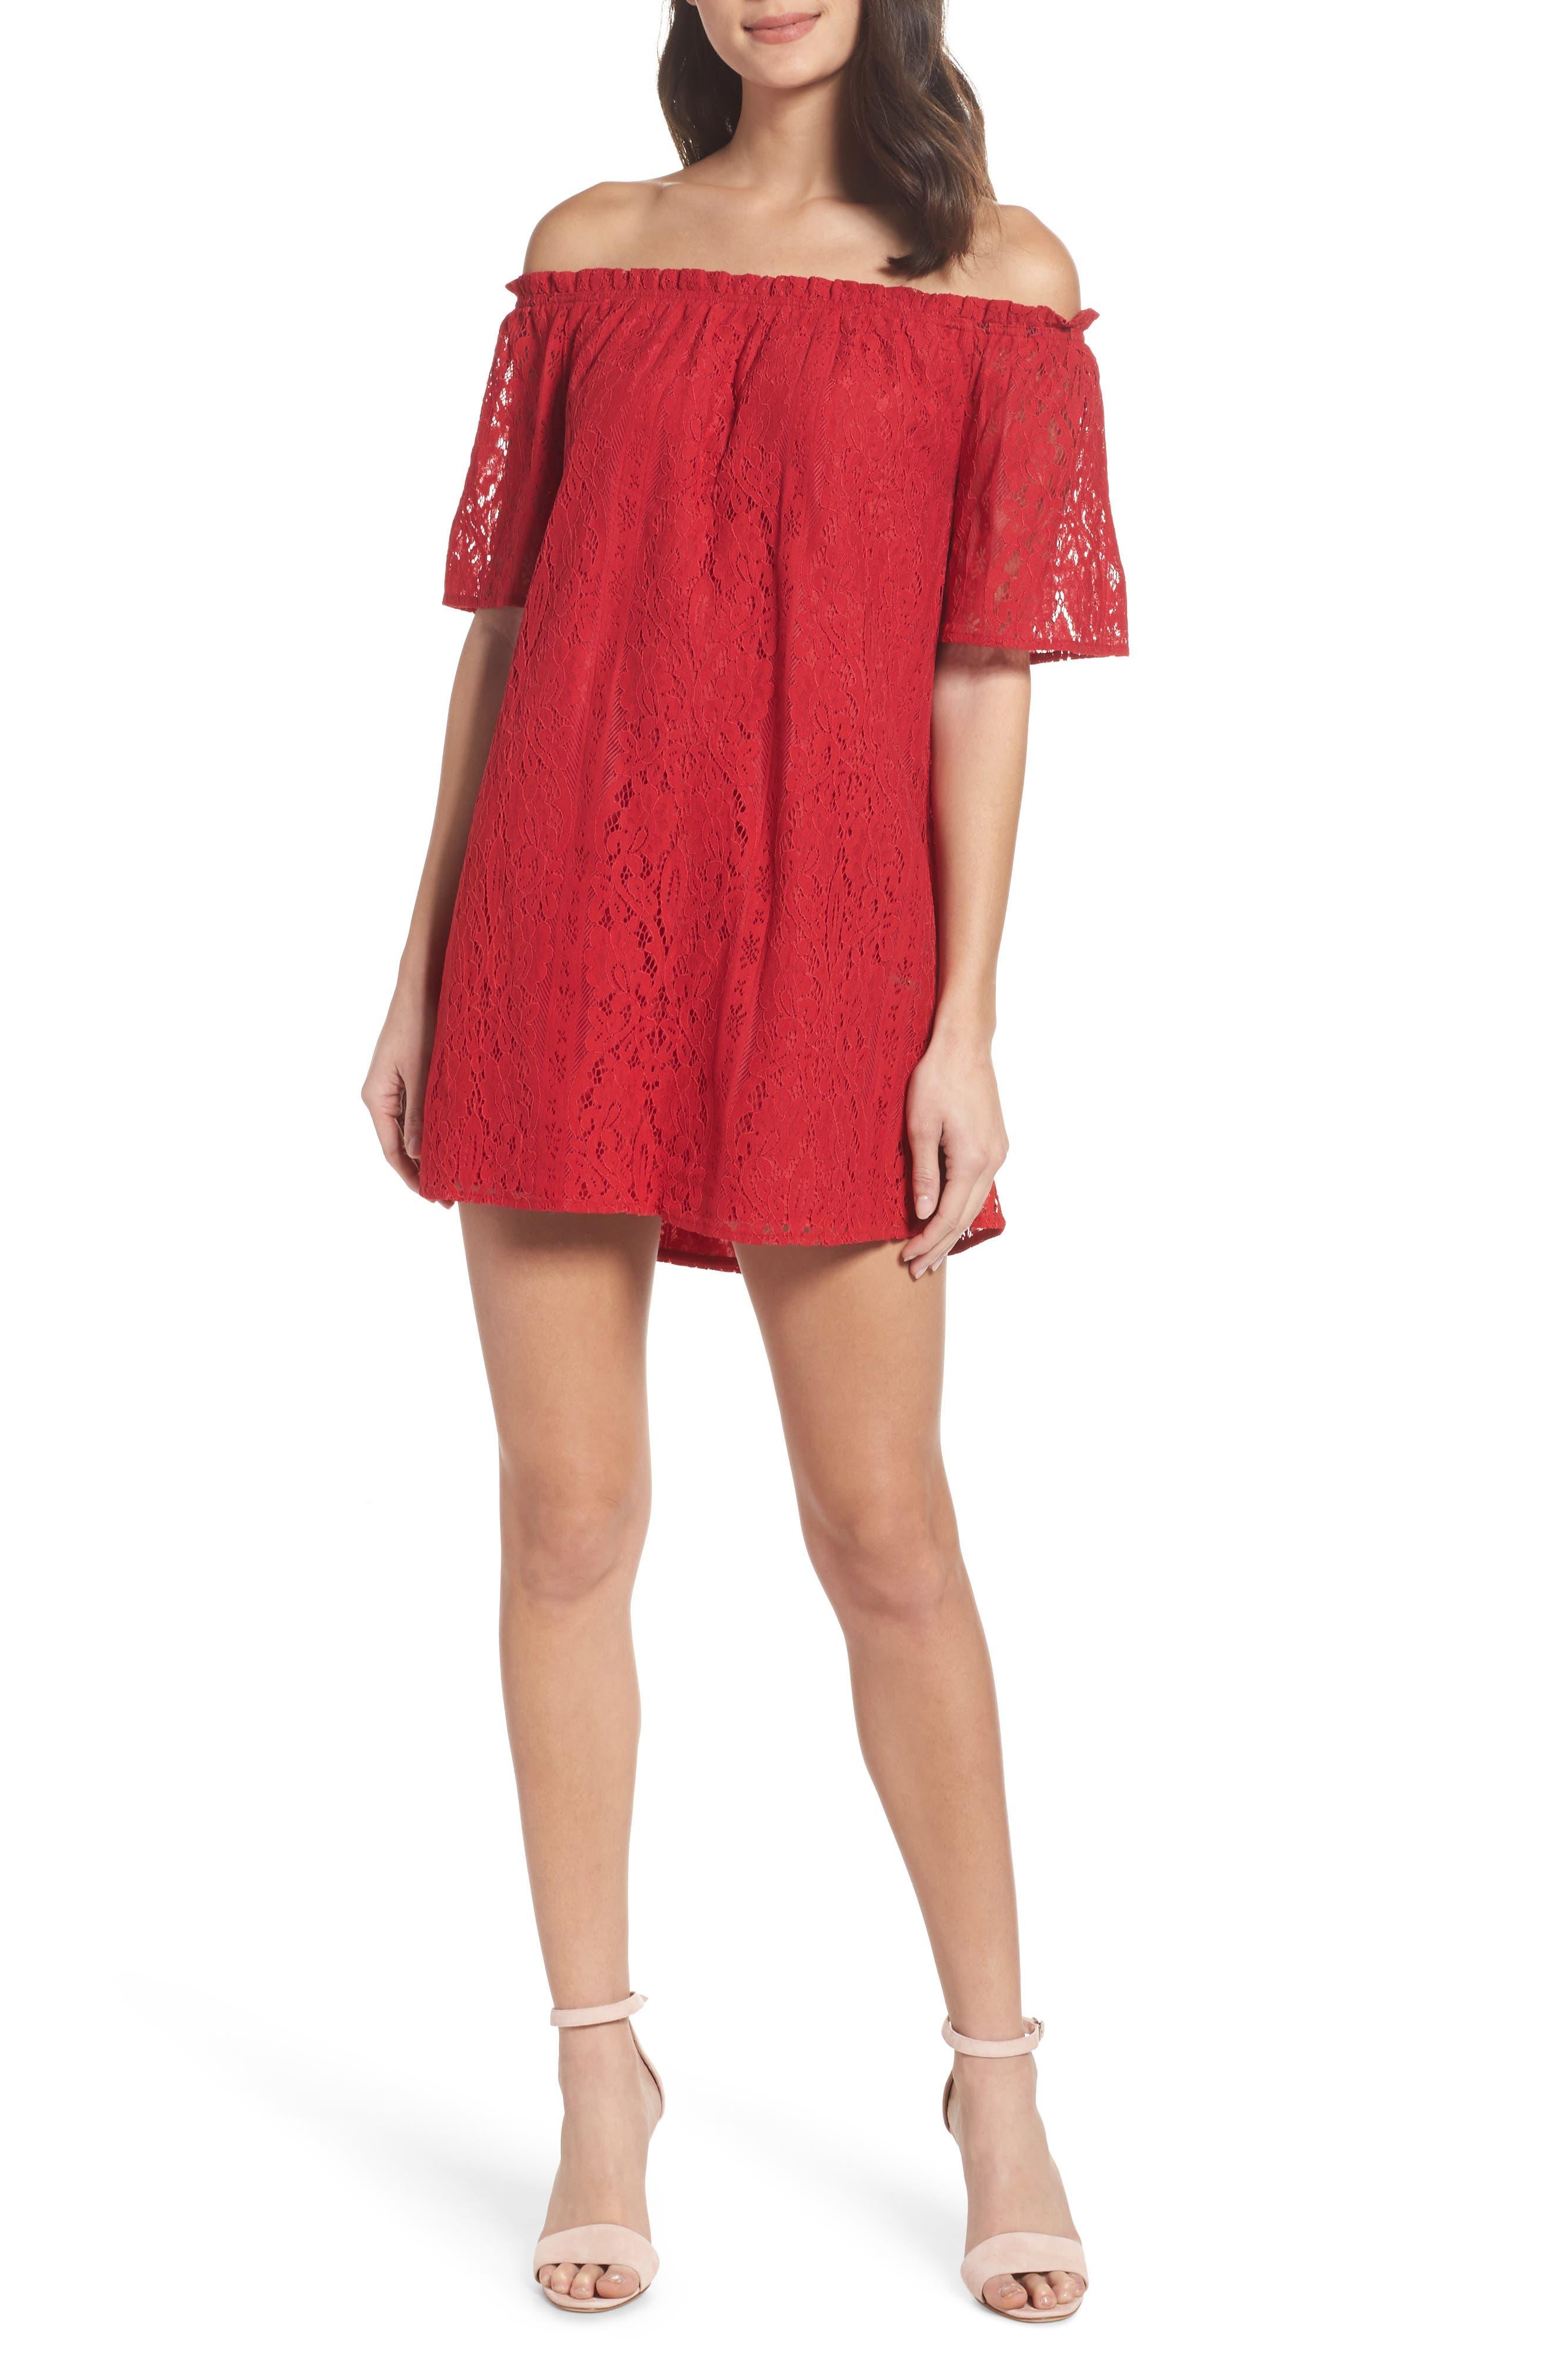 Alternate Image 1 Selected - BB Dakota Erica Off the Shoulder Lace Shift Dress